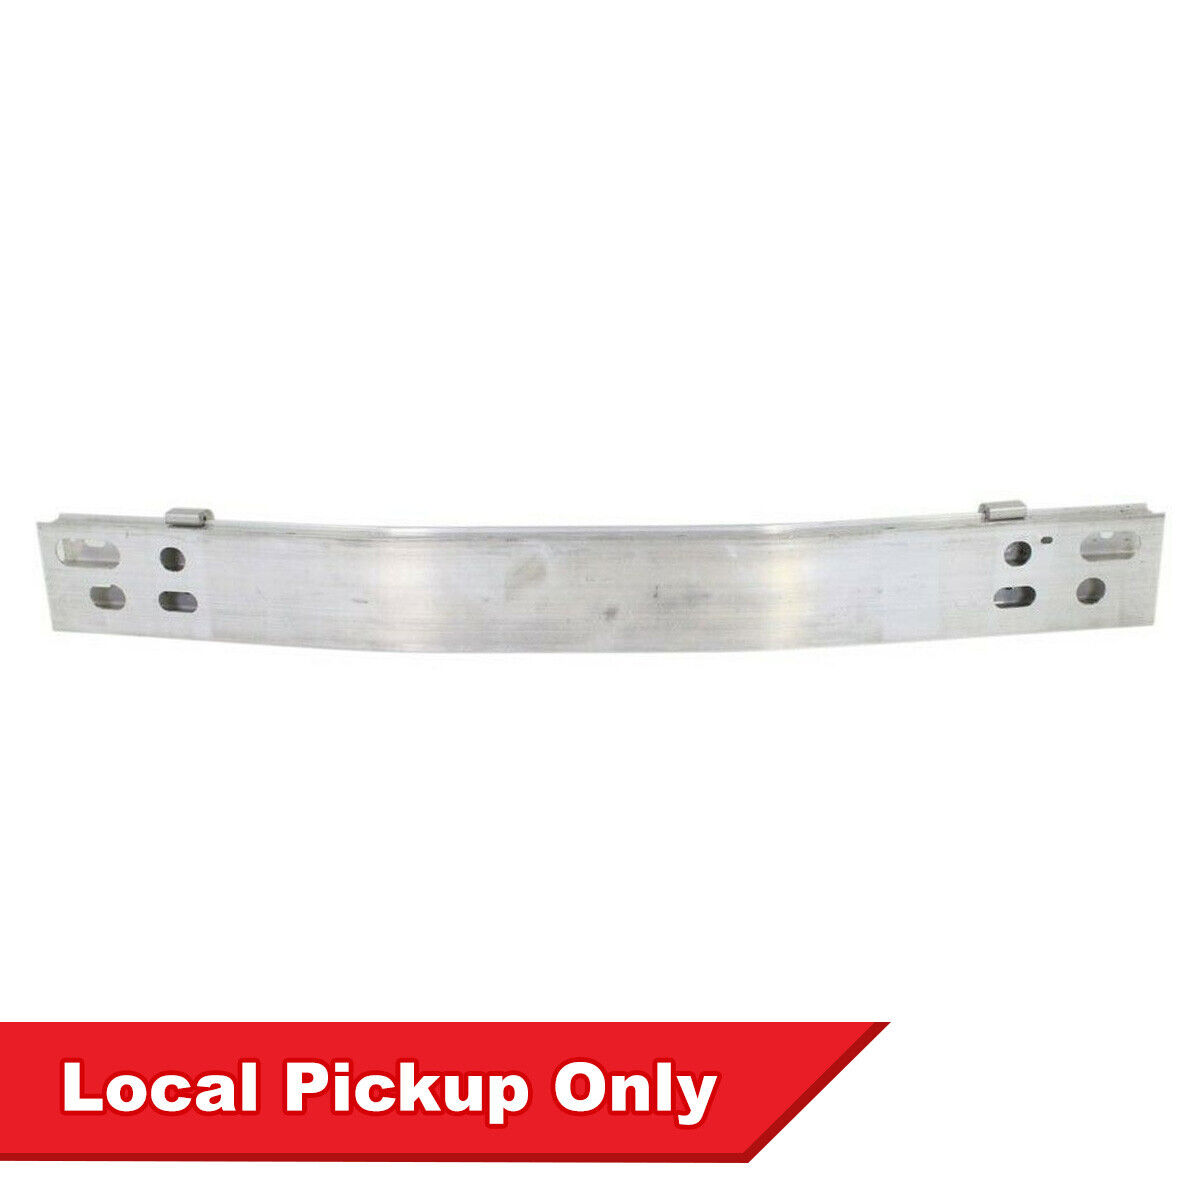 For Toyota Prius 2010-2015 K-Metal 7148431 Front Bumper Reinforcement